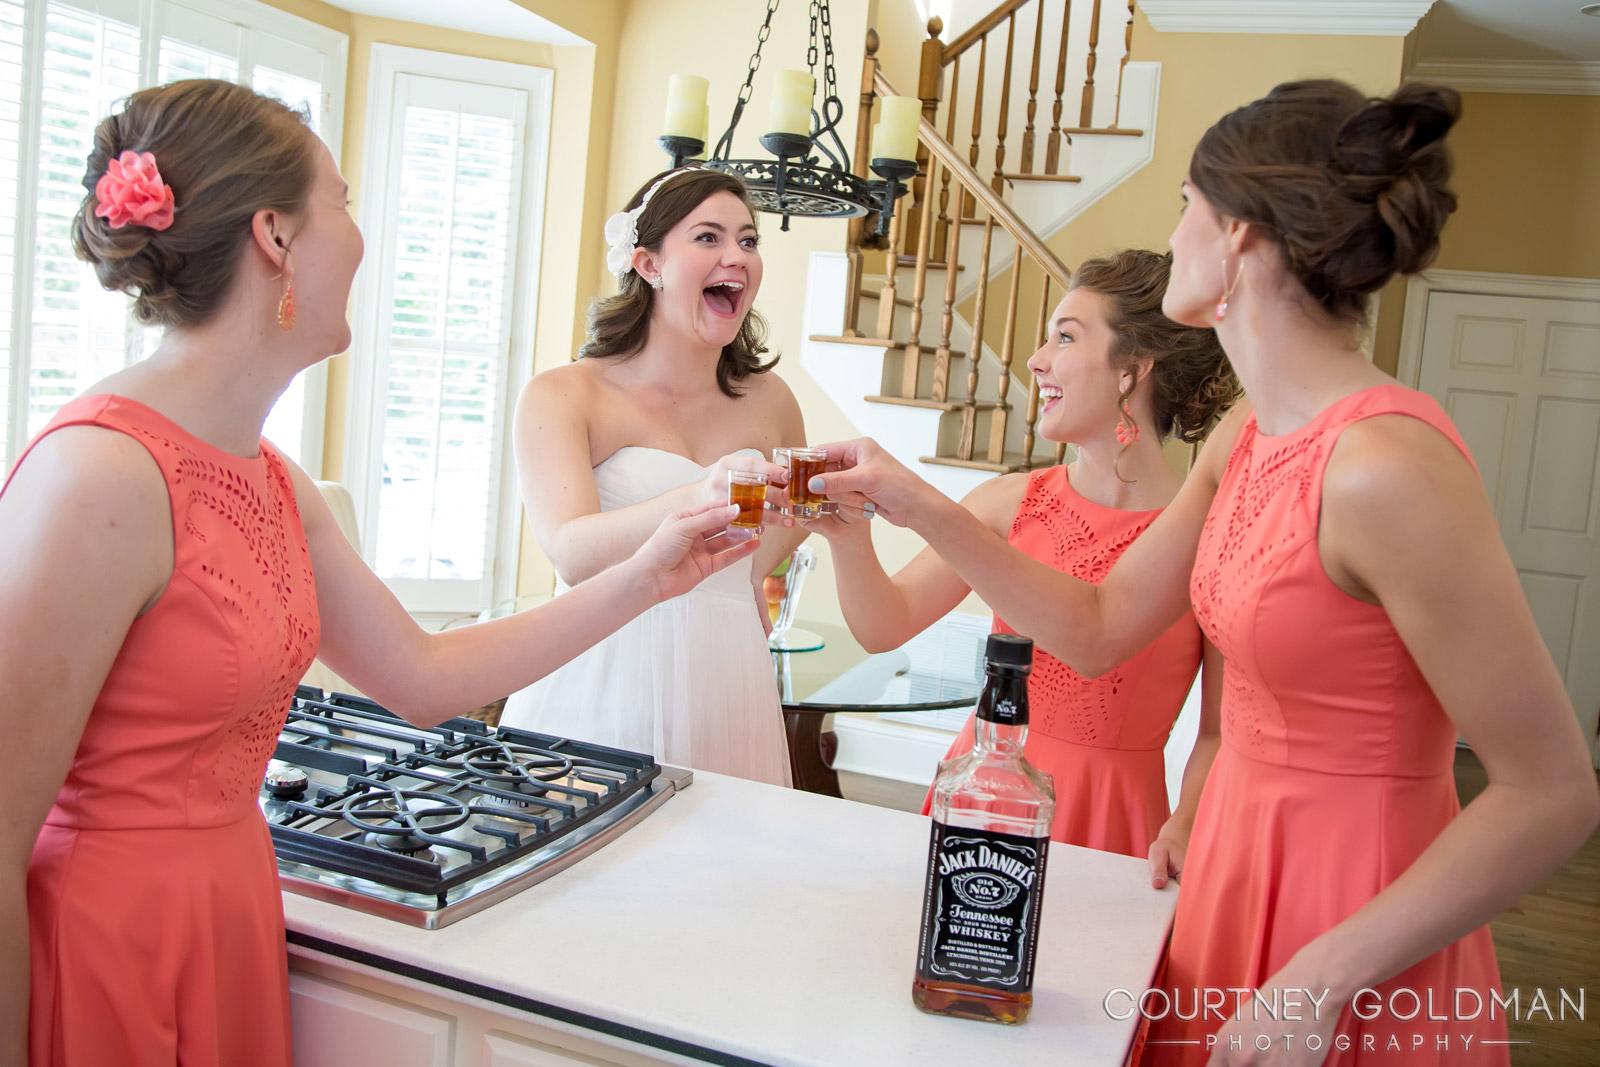 Atlanta-Wedding-Photography-by-Courtney-Goldman-01.jpg